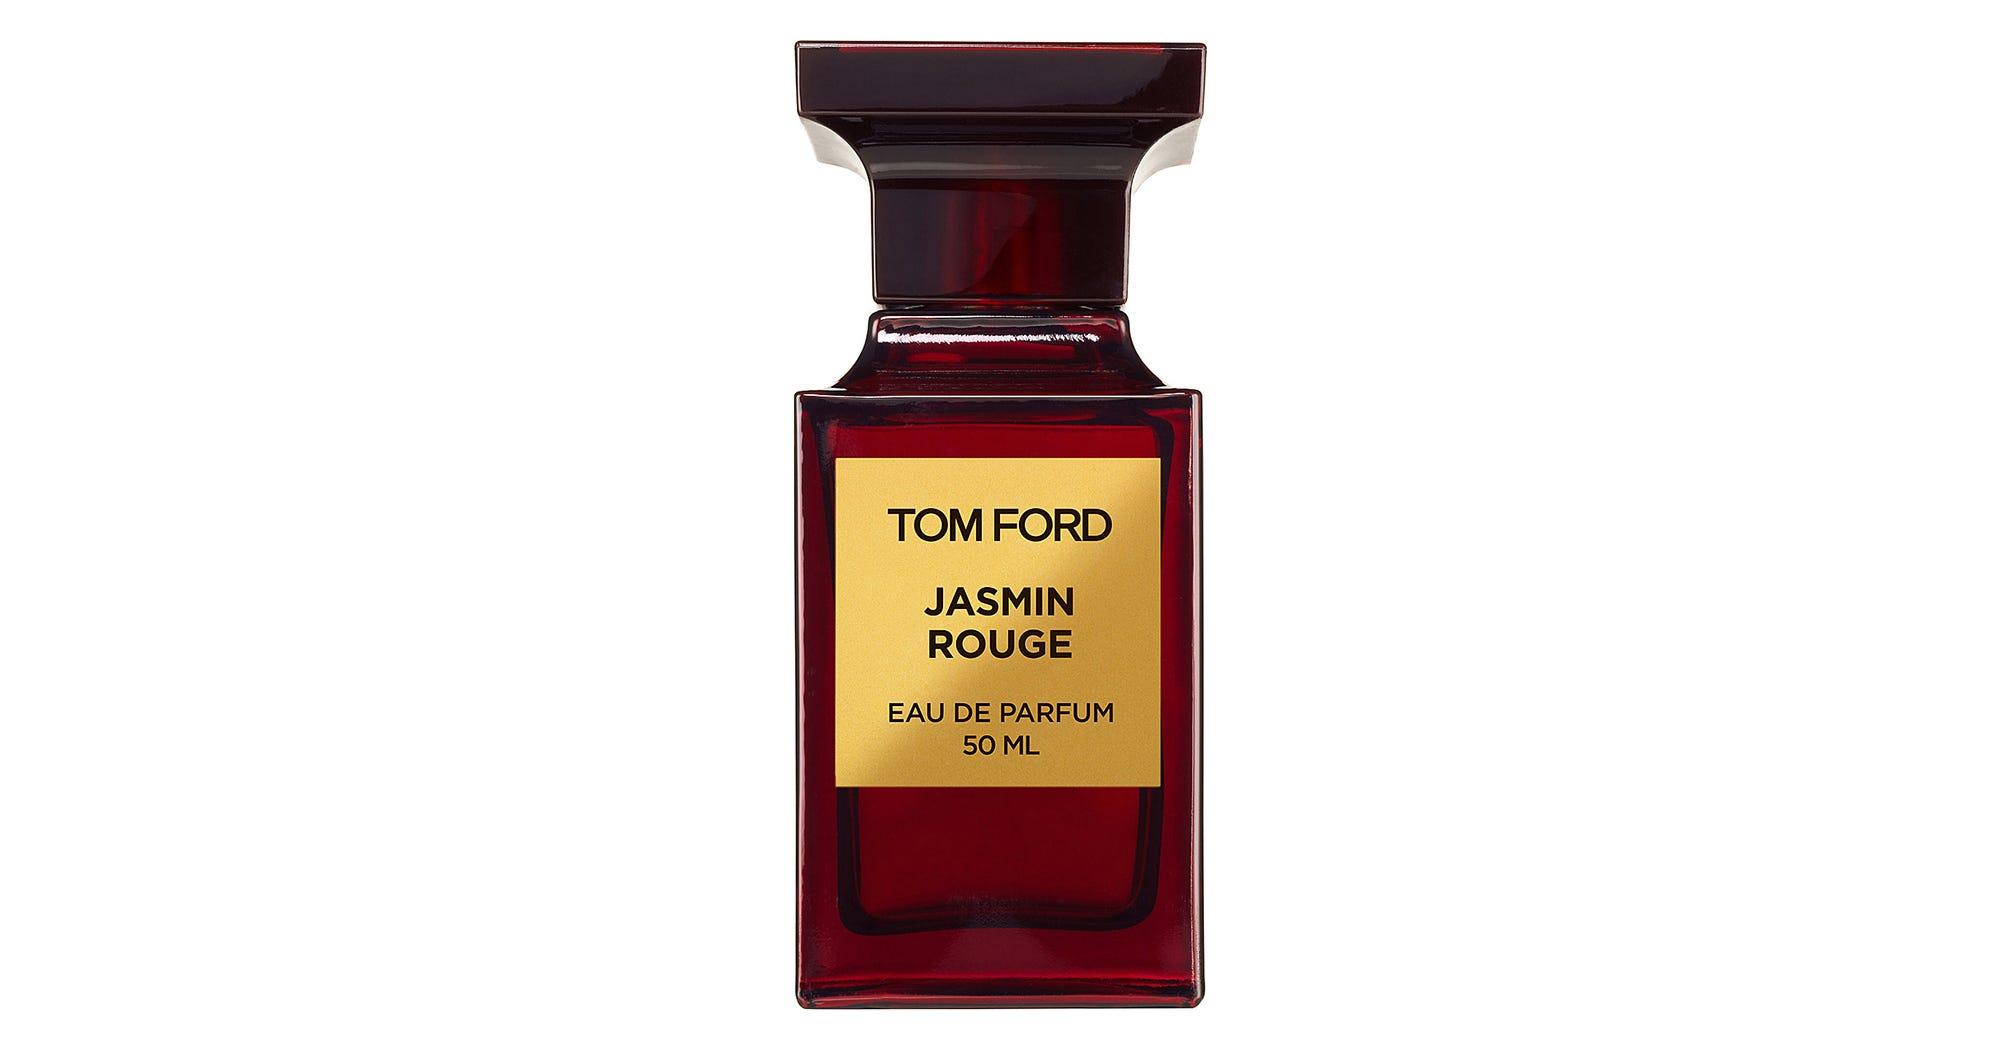 9 Fragrances Refinery29 Editors Wear All Year Long